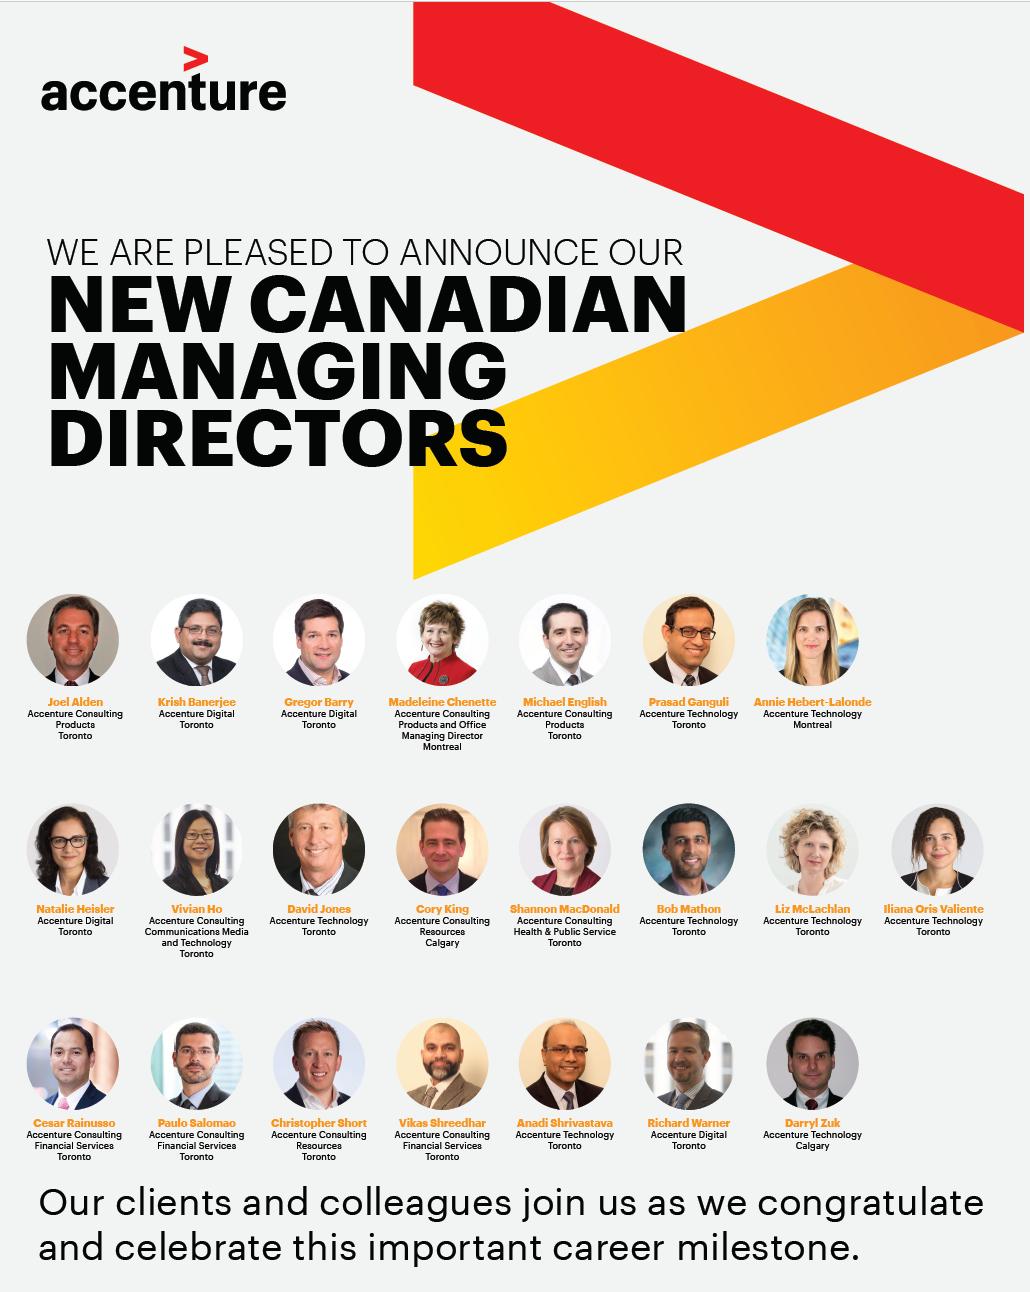 New Managing Directors in Canada | Accenture